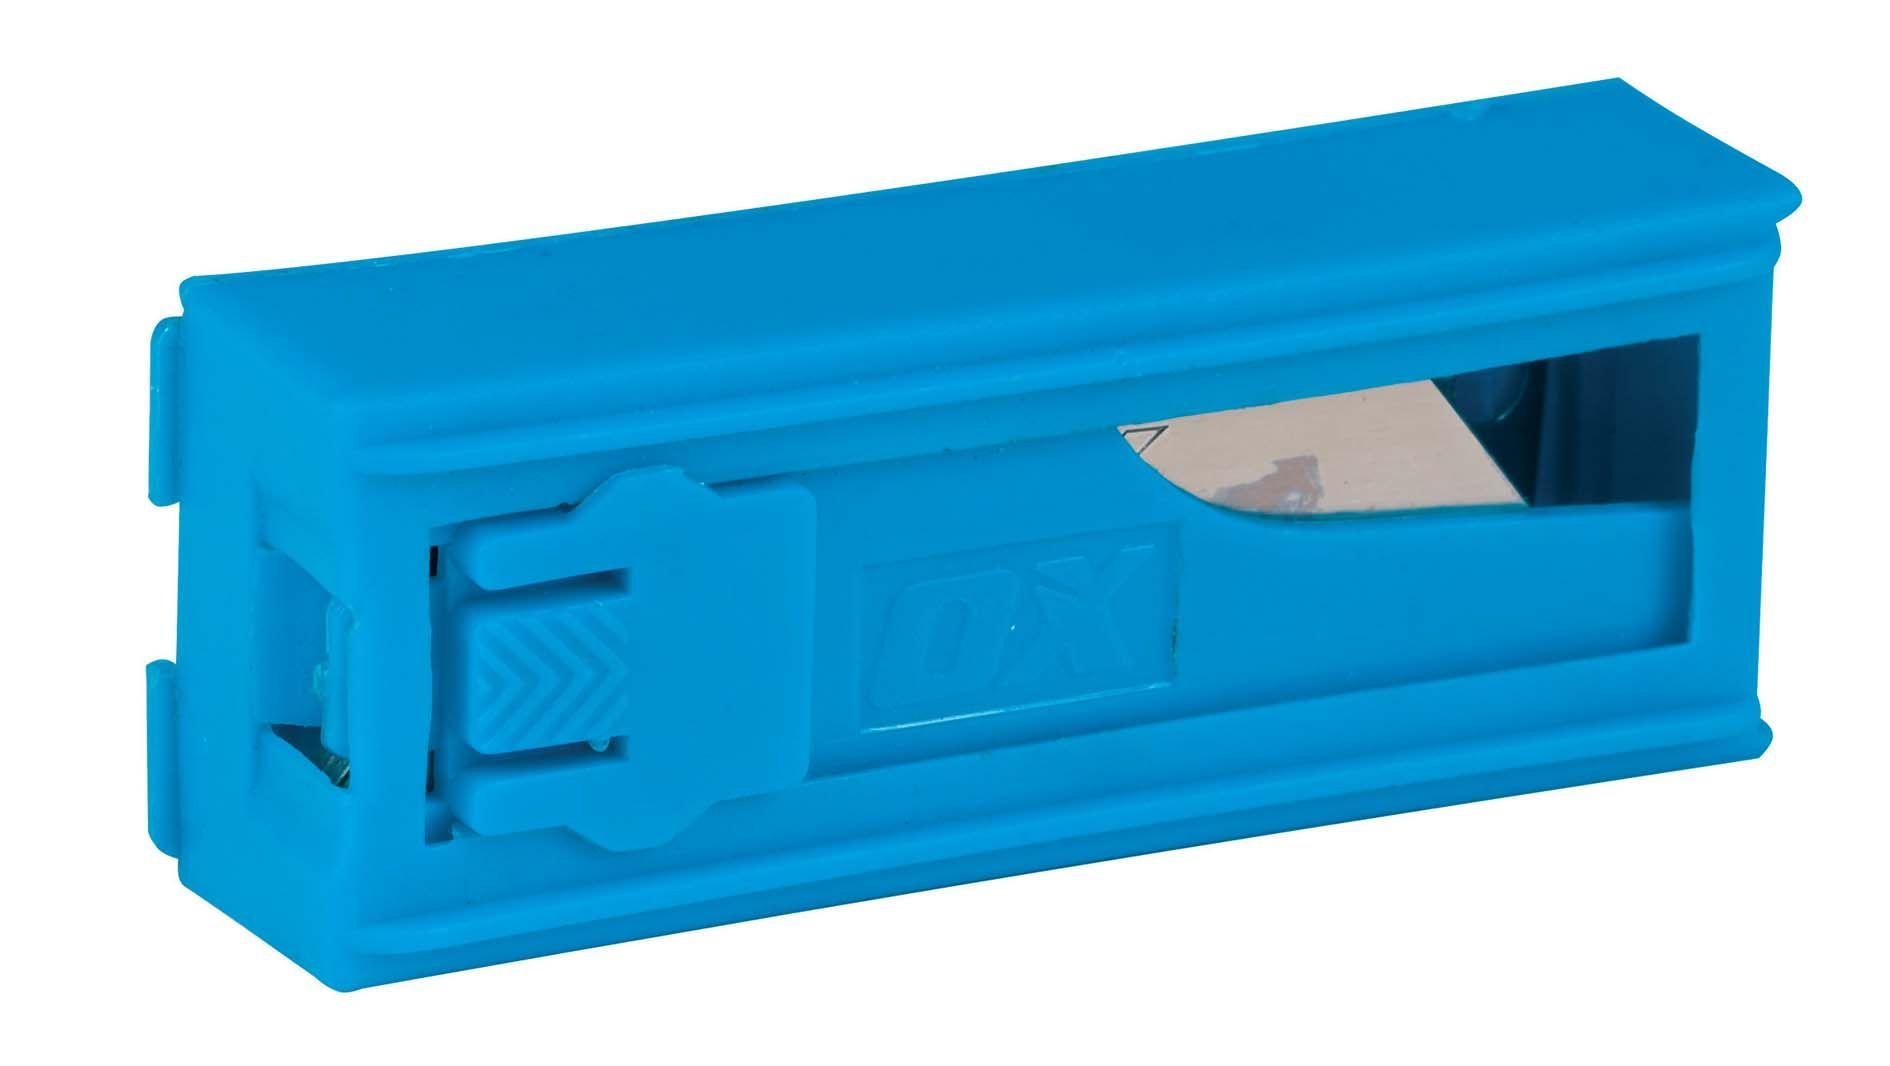 OX Pro Heavy Duty Knife Blades & Dispenser 10 Pack